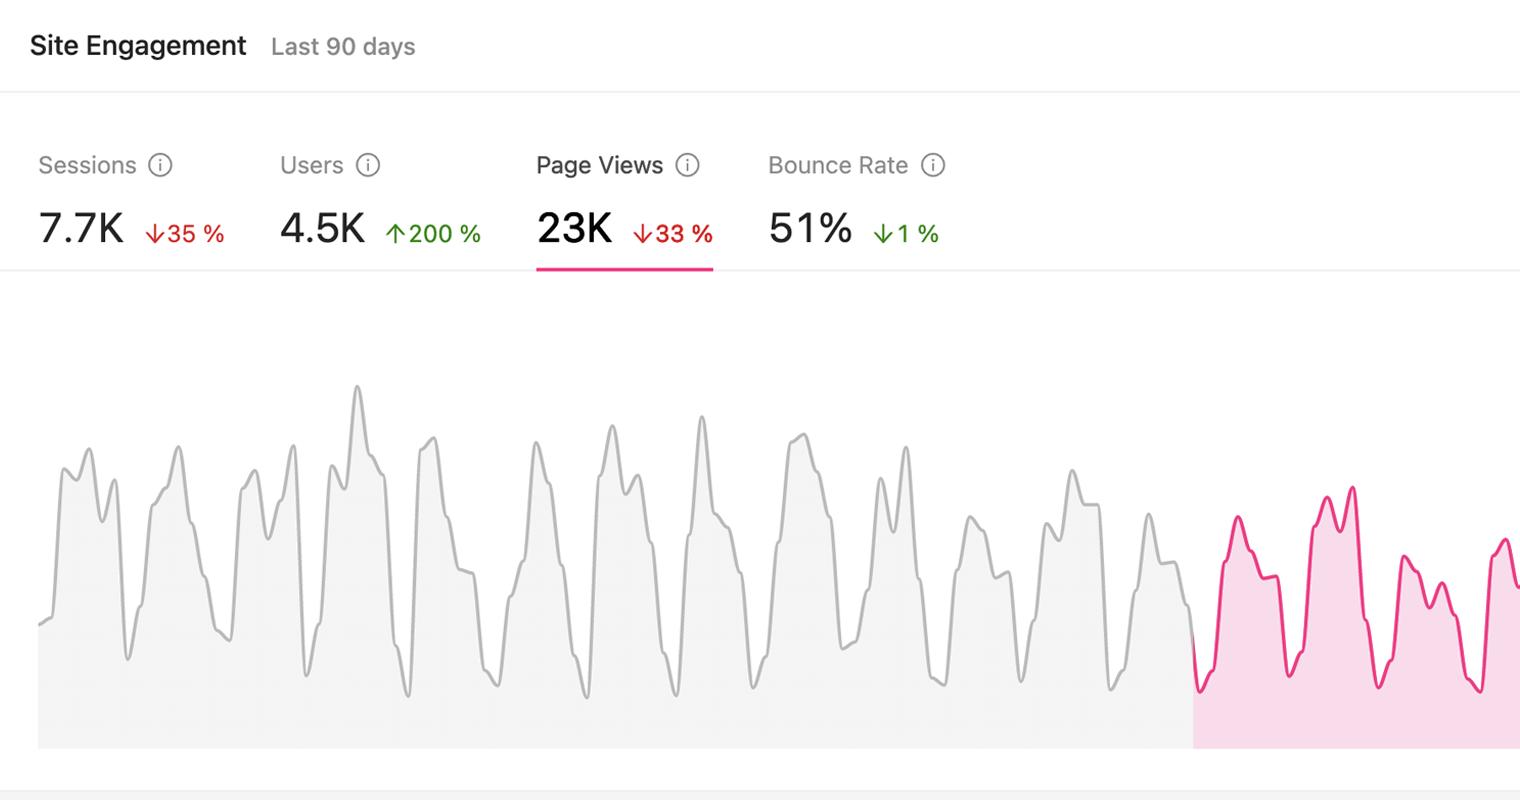 importance of marketing analytics - Growmatik analytics - site engagement